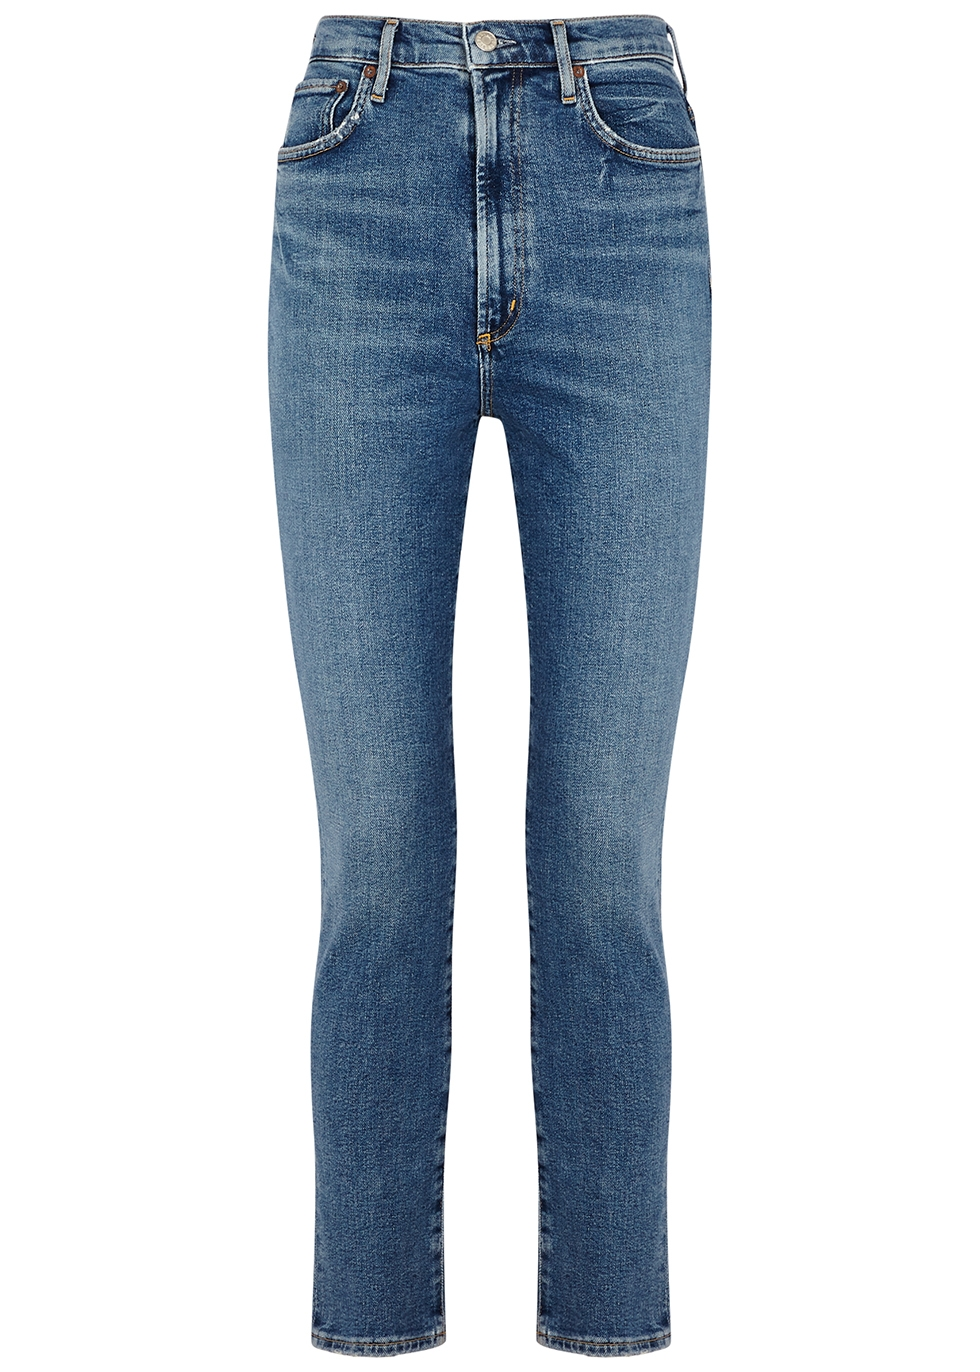 Pinch Waist blue skinny jeans